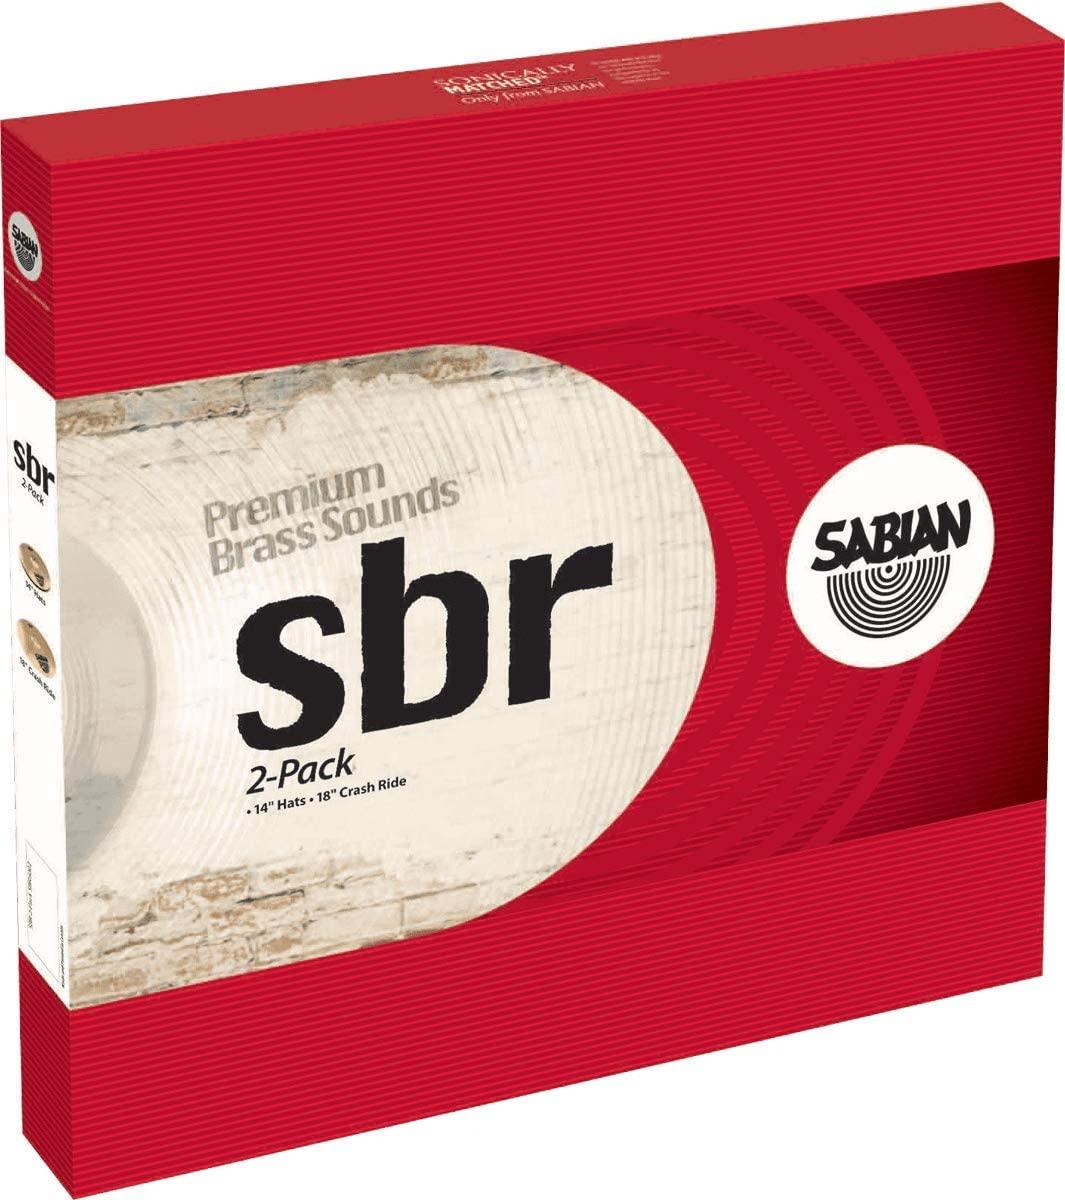 Sabian Cymbals SBR5002 SBR 2-Pack 14